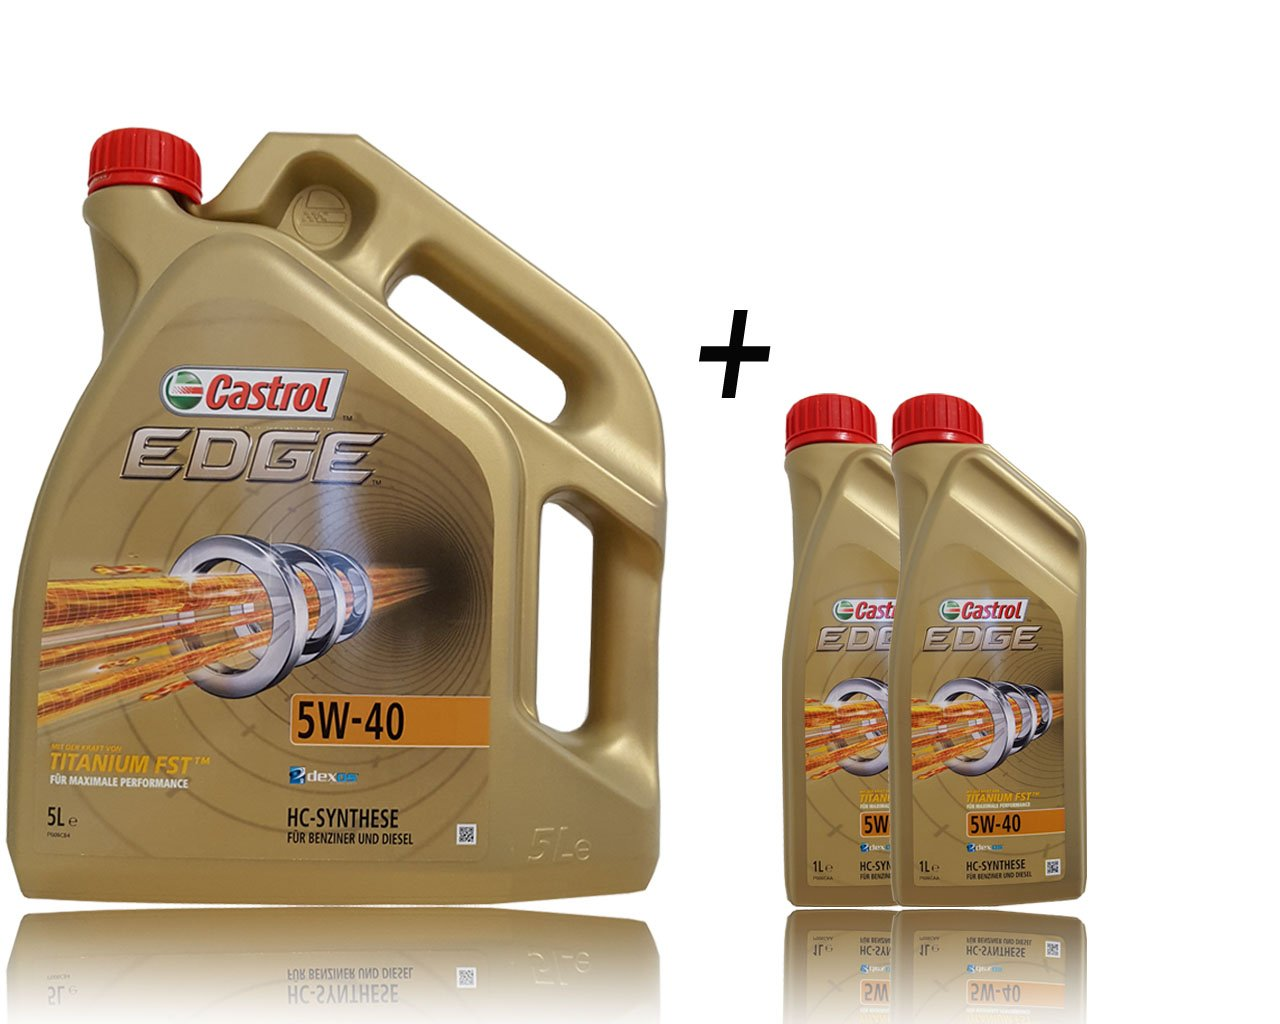 2 x 1 5 L, l = 7 litres de castrol eDGE titanium fSTTM 5W - 40 huile moteur castrol moteur-huile à l'huile avec pendentif-particularités :  aCEA c3, aPI sN cF, vW/501 505/505/00, 00 01, bMW longlife - 04 mB freigabe 229.51 -, 226.5/229.31 /;